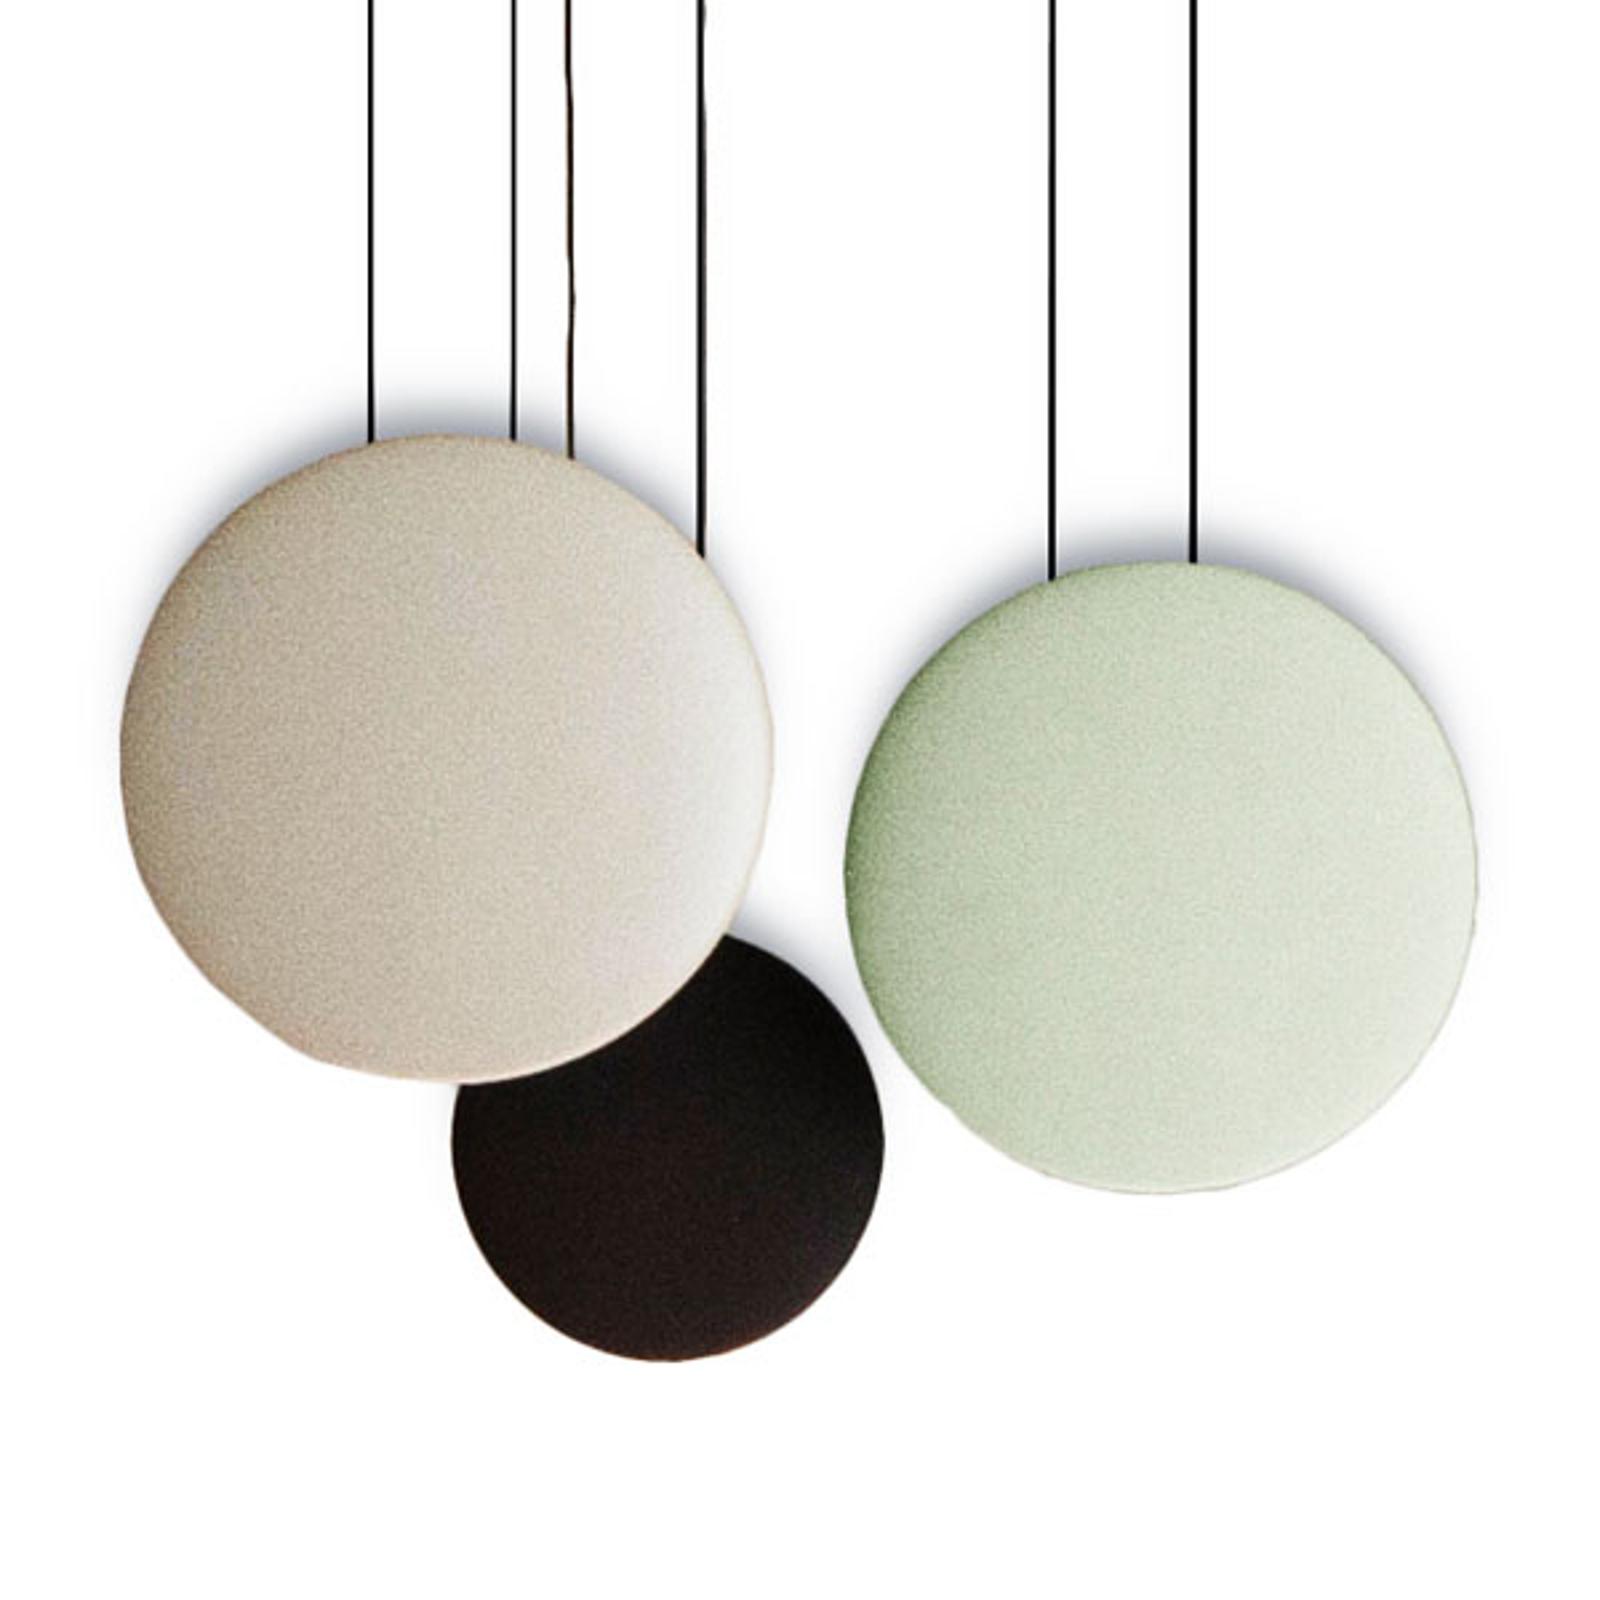 Lampa wisząca LED COSMOS, 55 cm